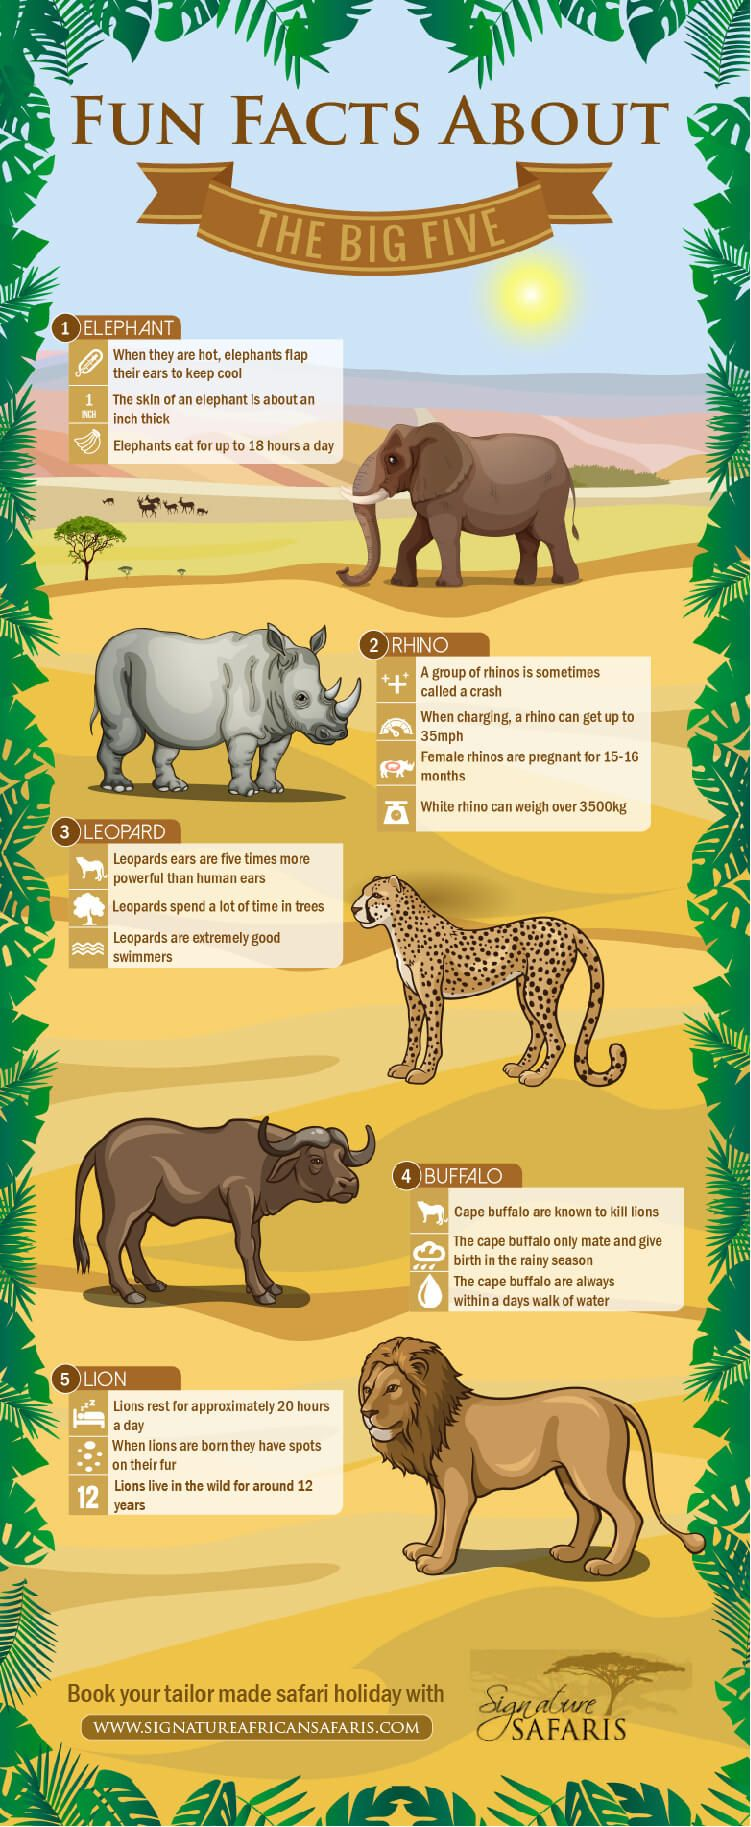 facts about the big 5 facts about the big five big five animals facts the big five facts